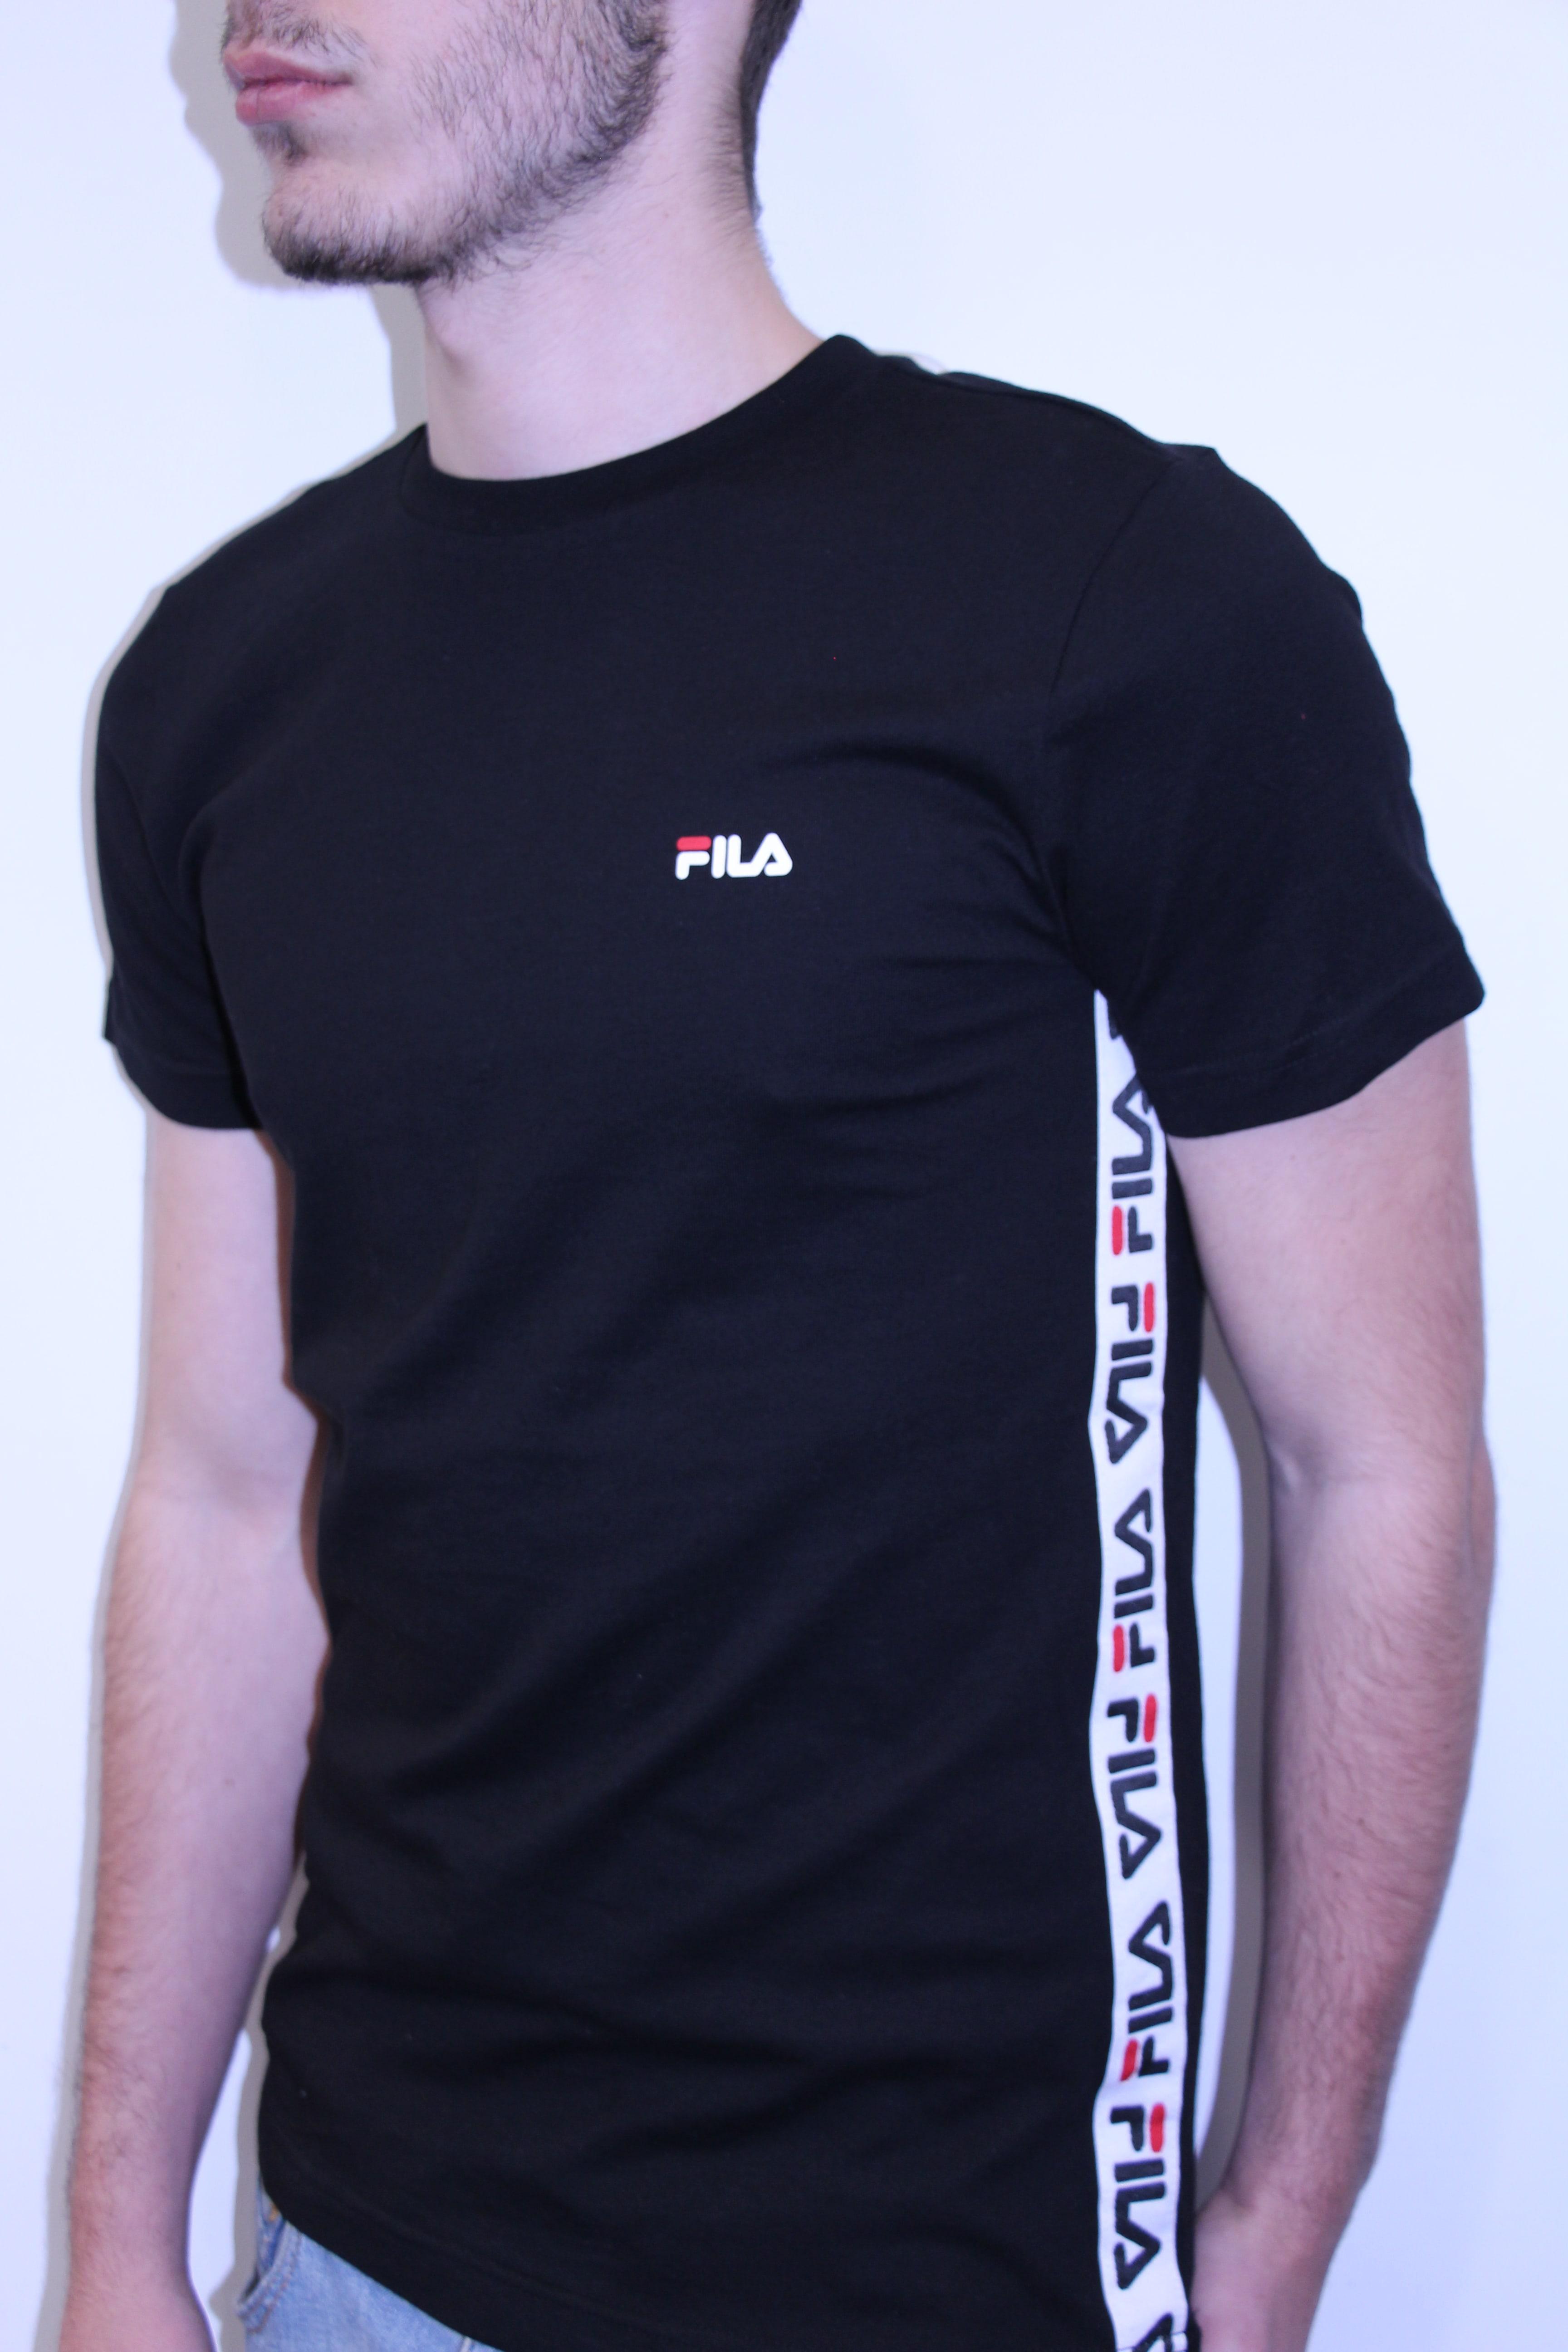 FILA Tee Shirt Bande Brodée Talan Noir SPORT AVENTURE